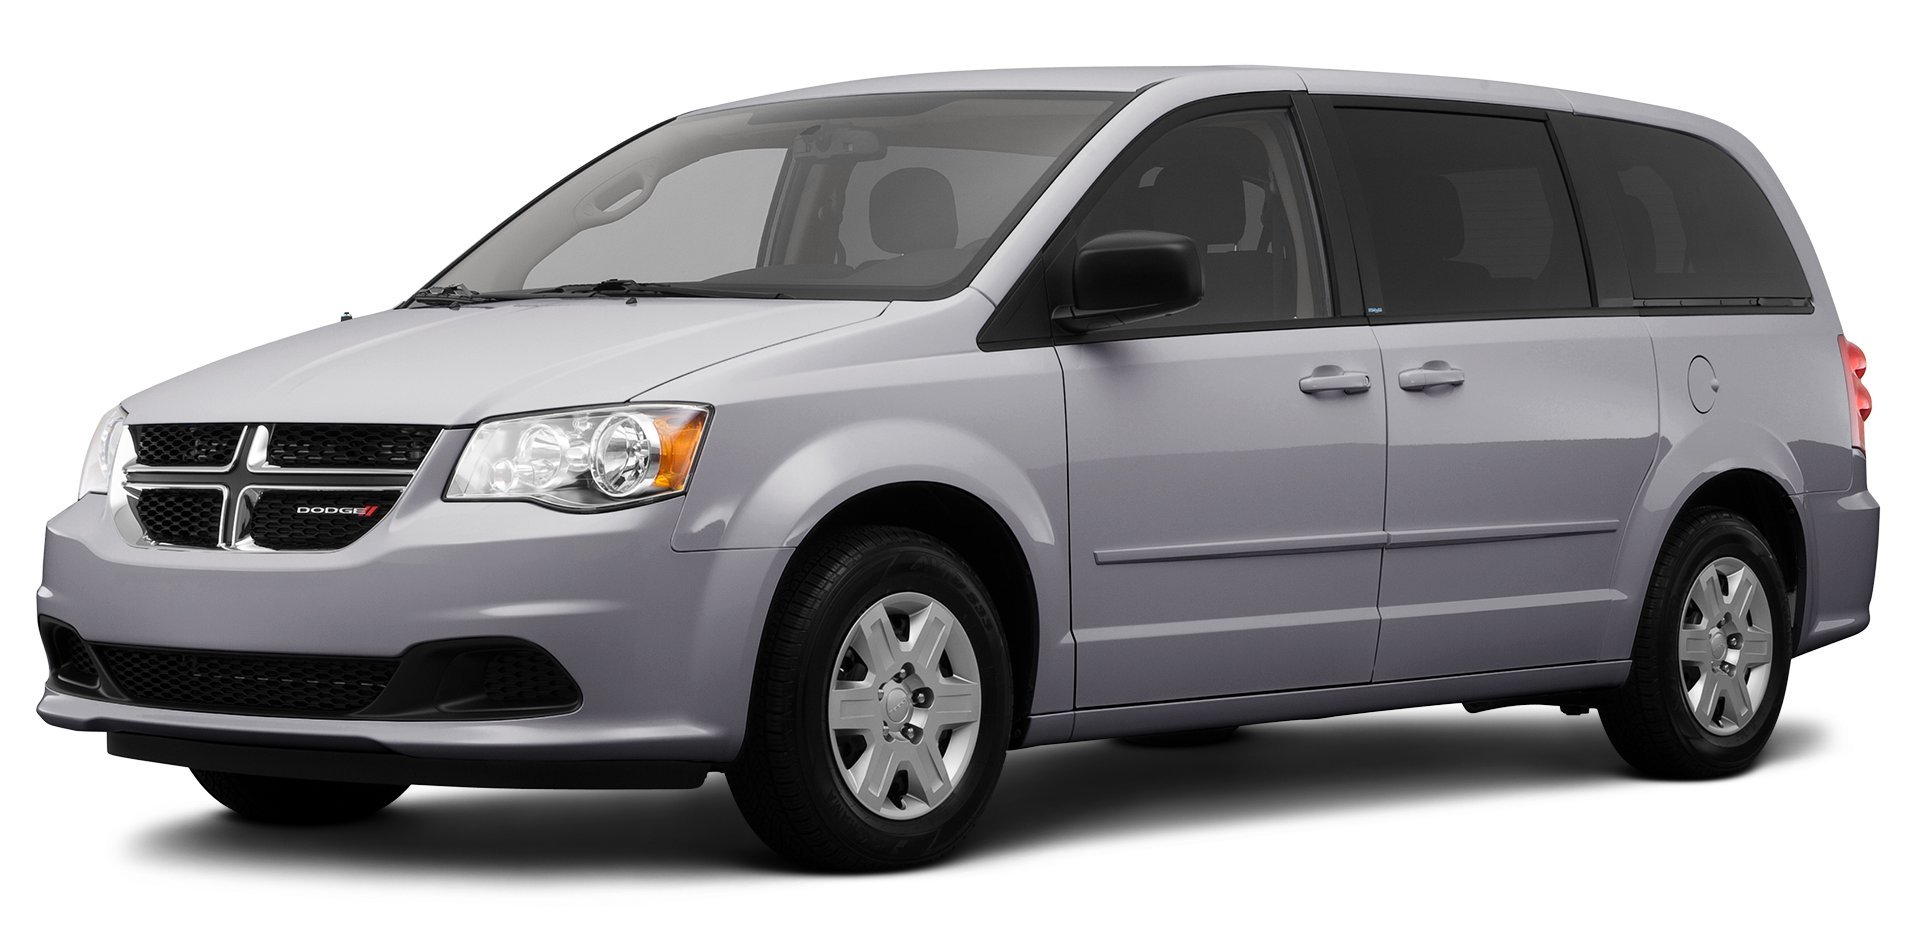 2013 dodge grand caravan reviews images and specs vehicles. Black Bedroom Furniture Sets. Home Design Ideas